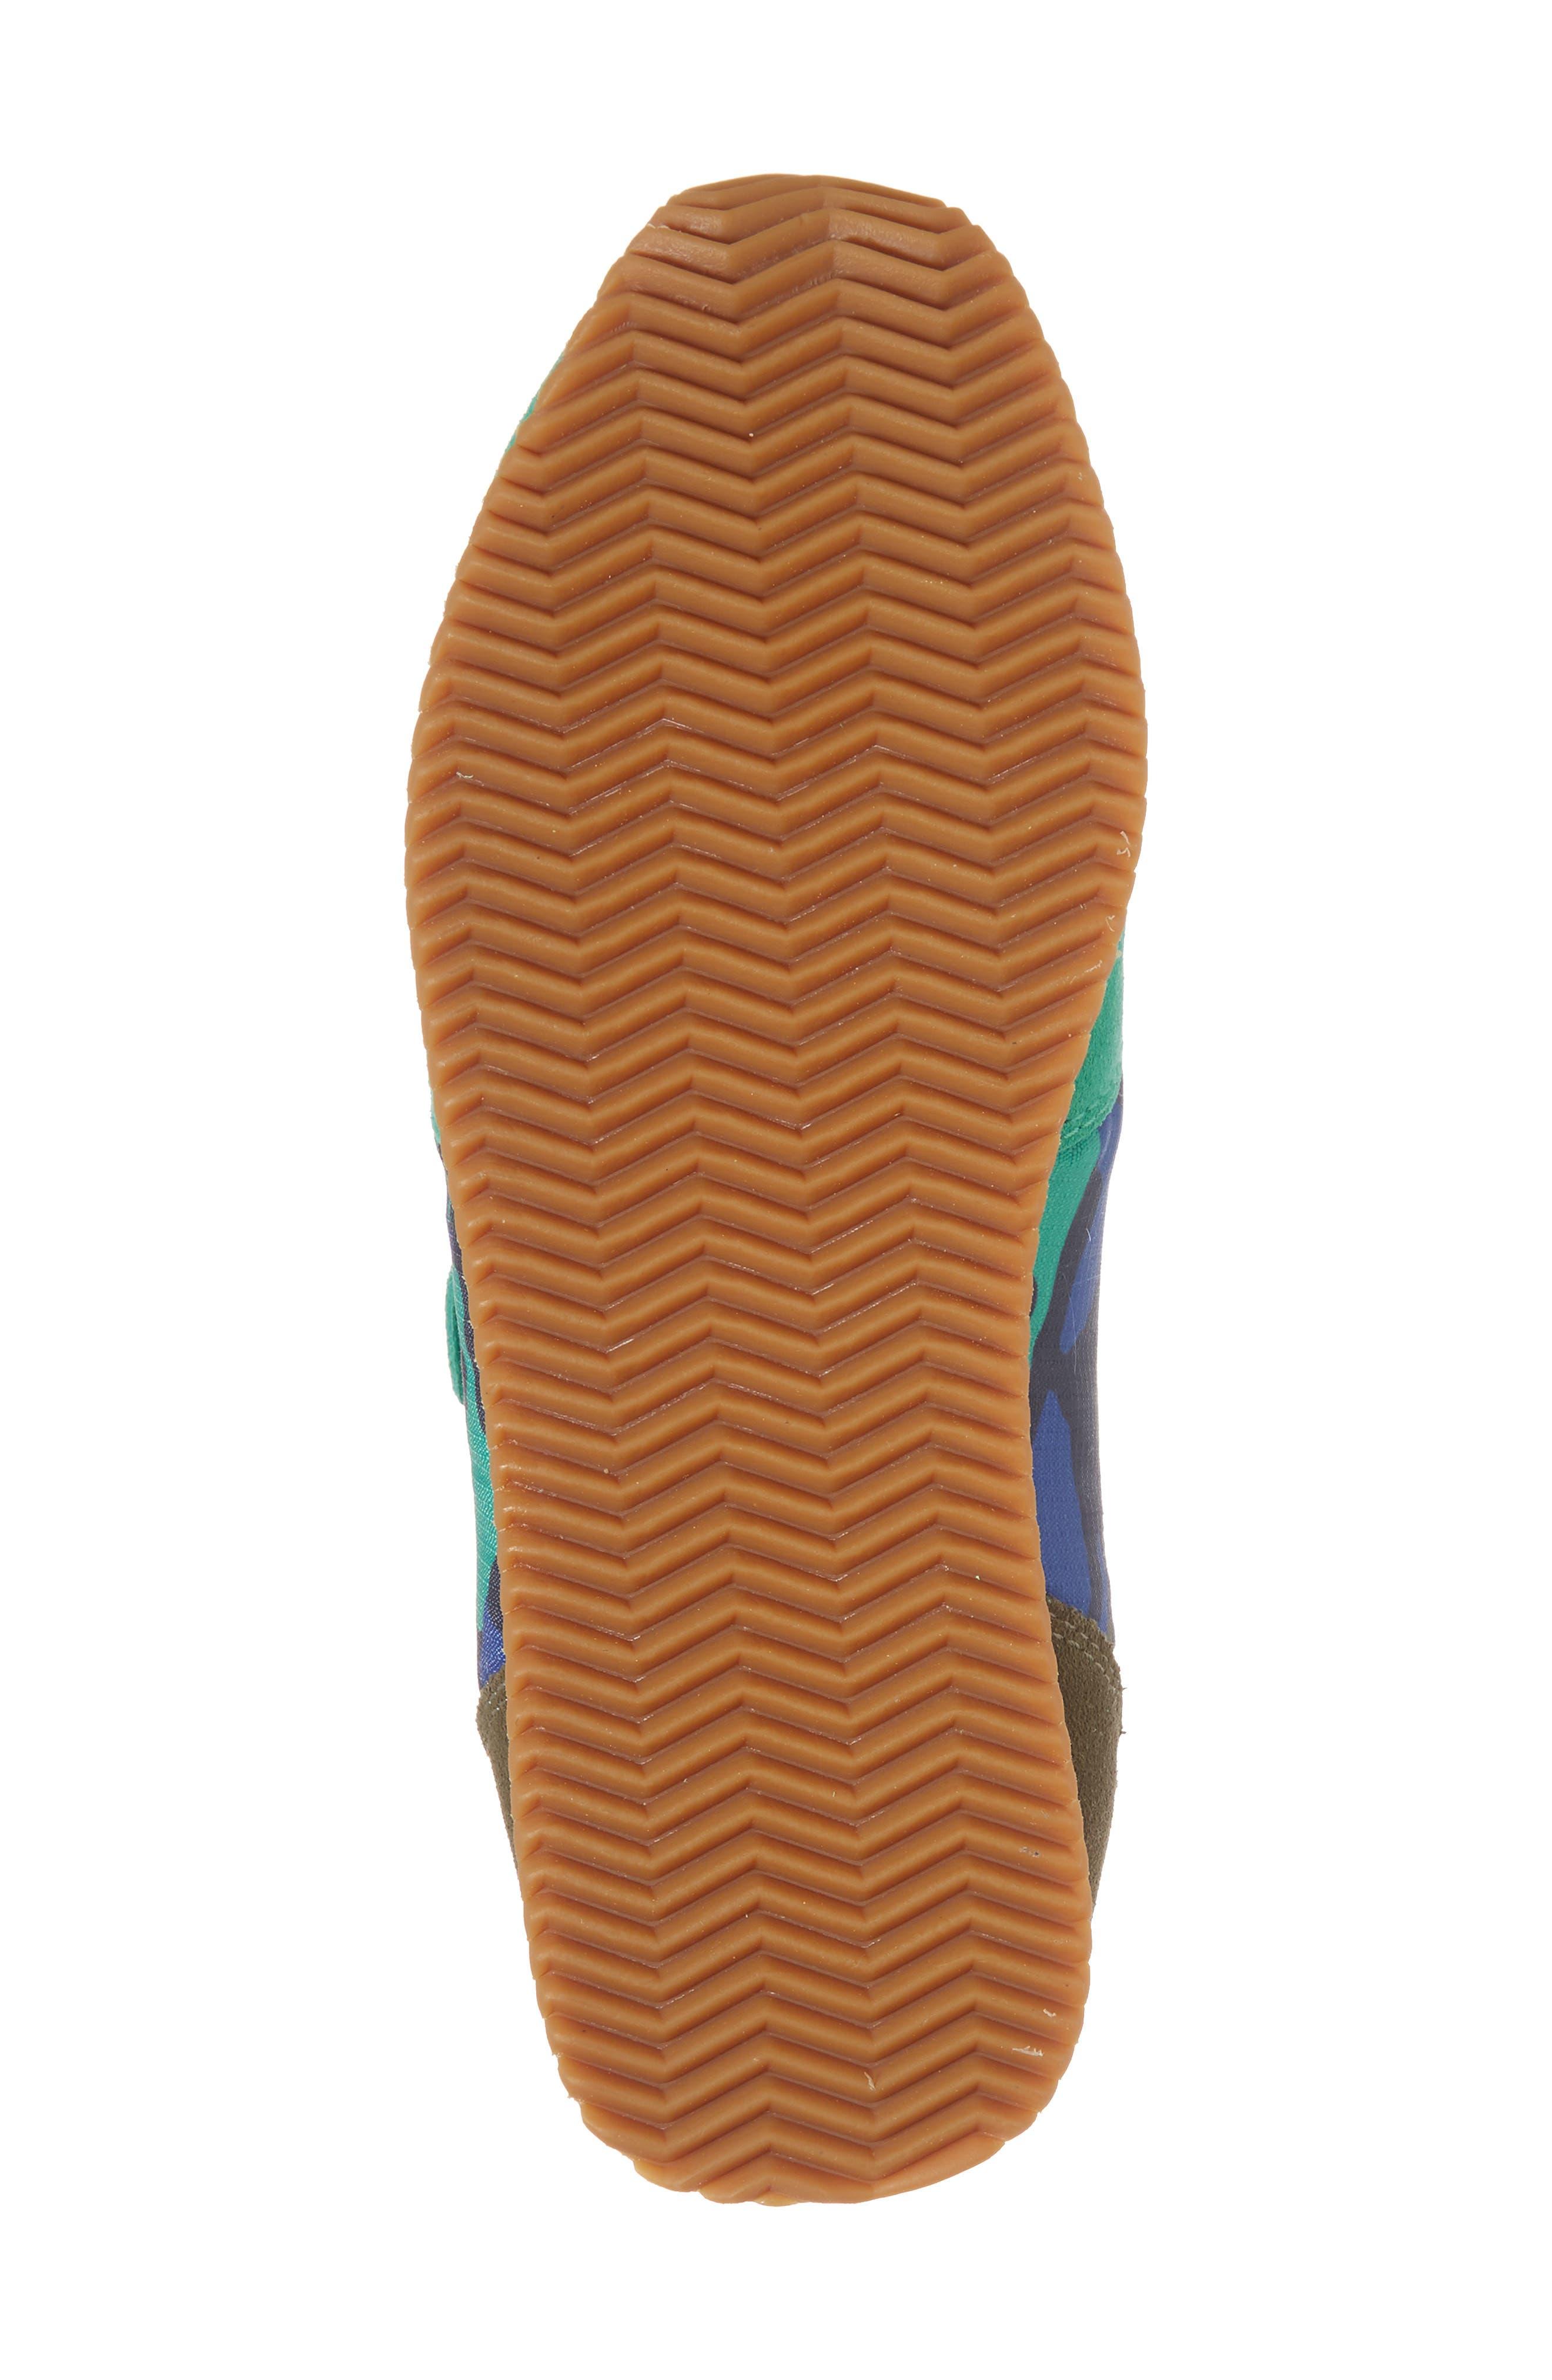 Print Sneakers,                             Alternate thumbnail 6, color,                             315